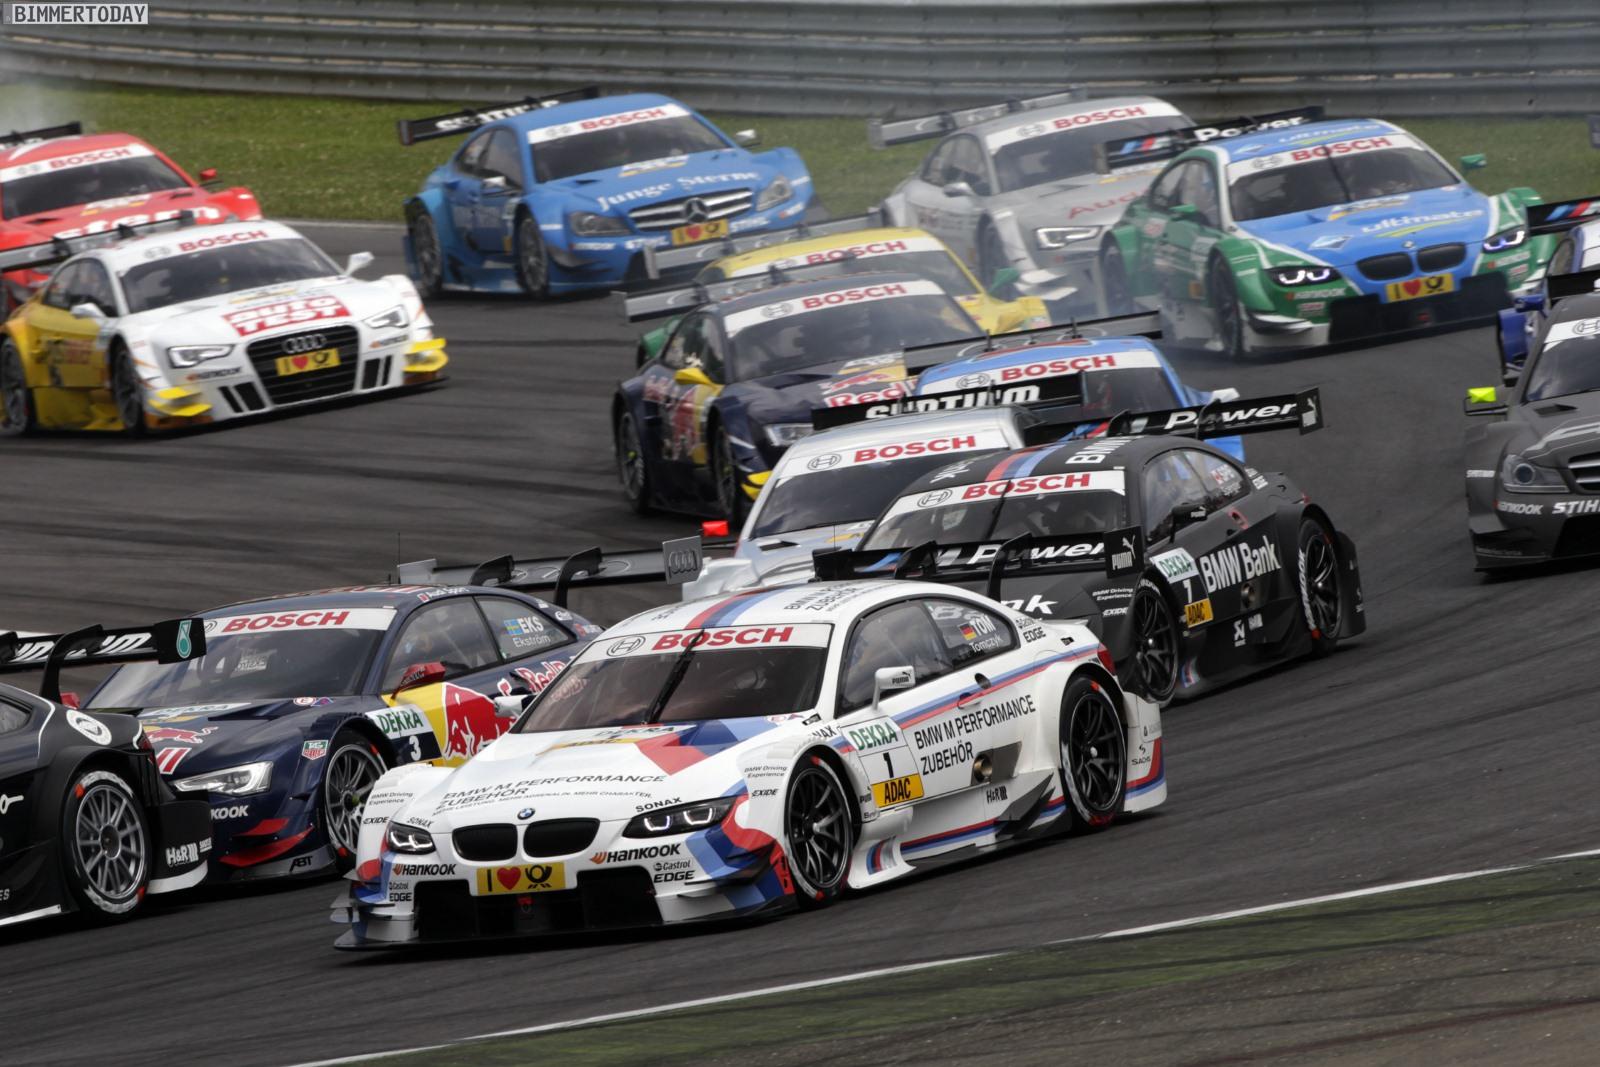 BMW-M3-DTM-2012-Spielberg-22